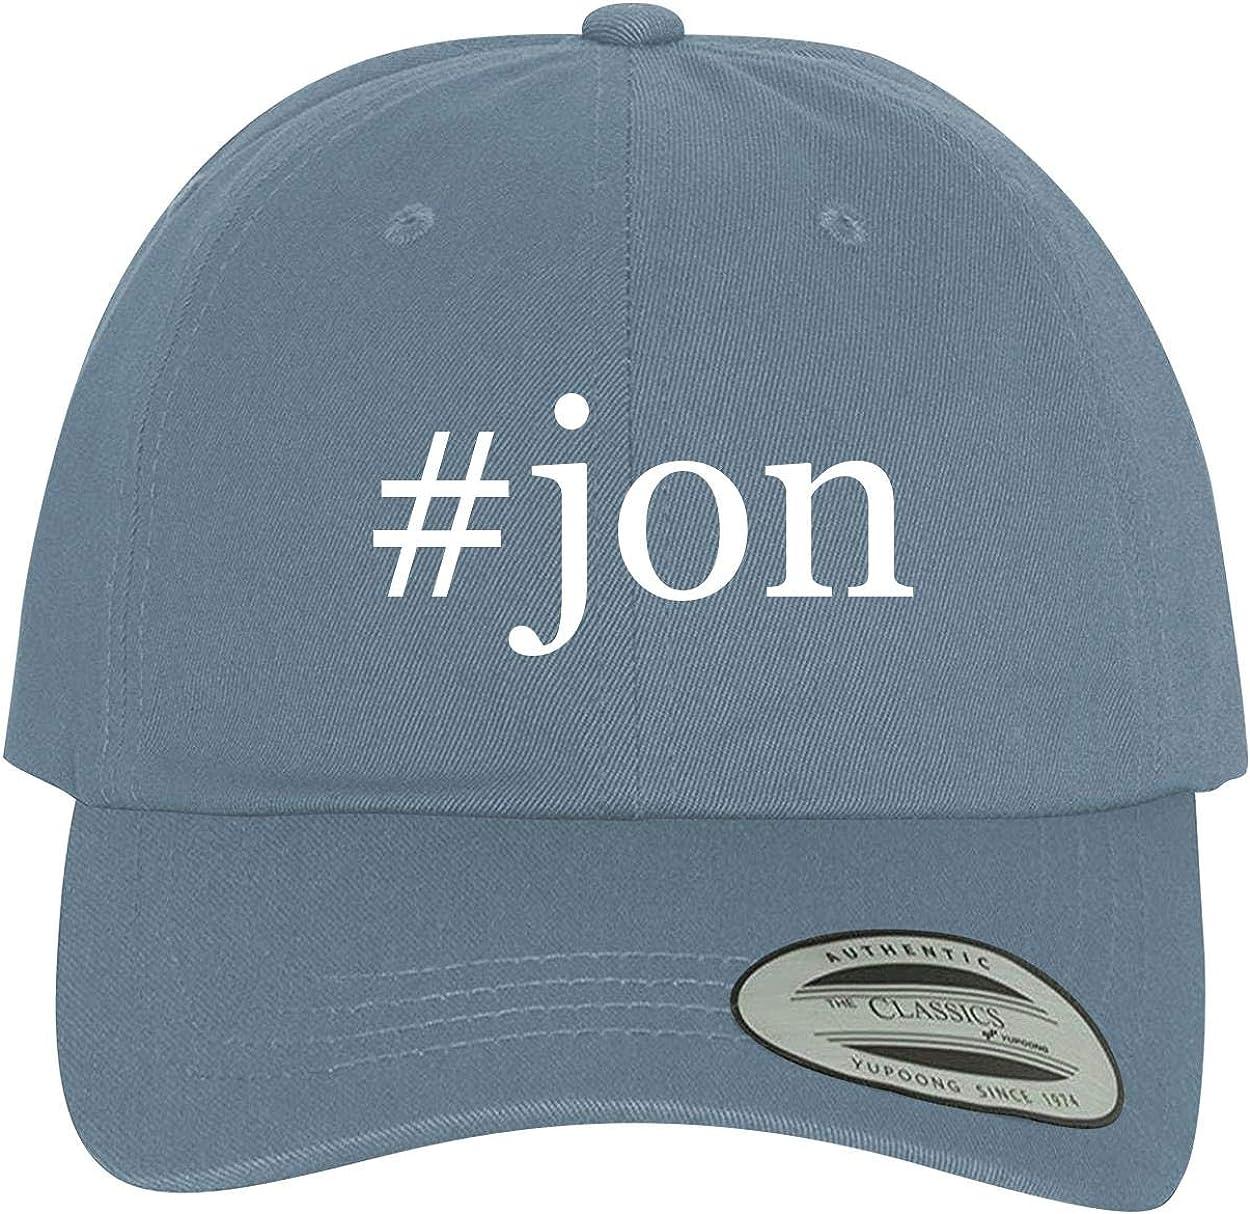 BH Cool Designs #Jon Comfortable Dad Hat Baseball Cap